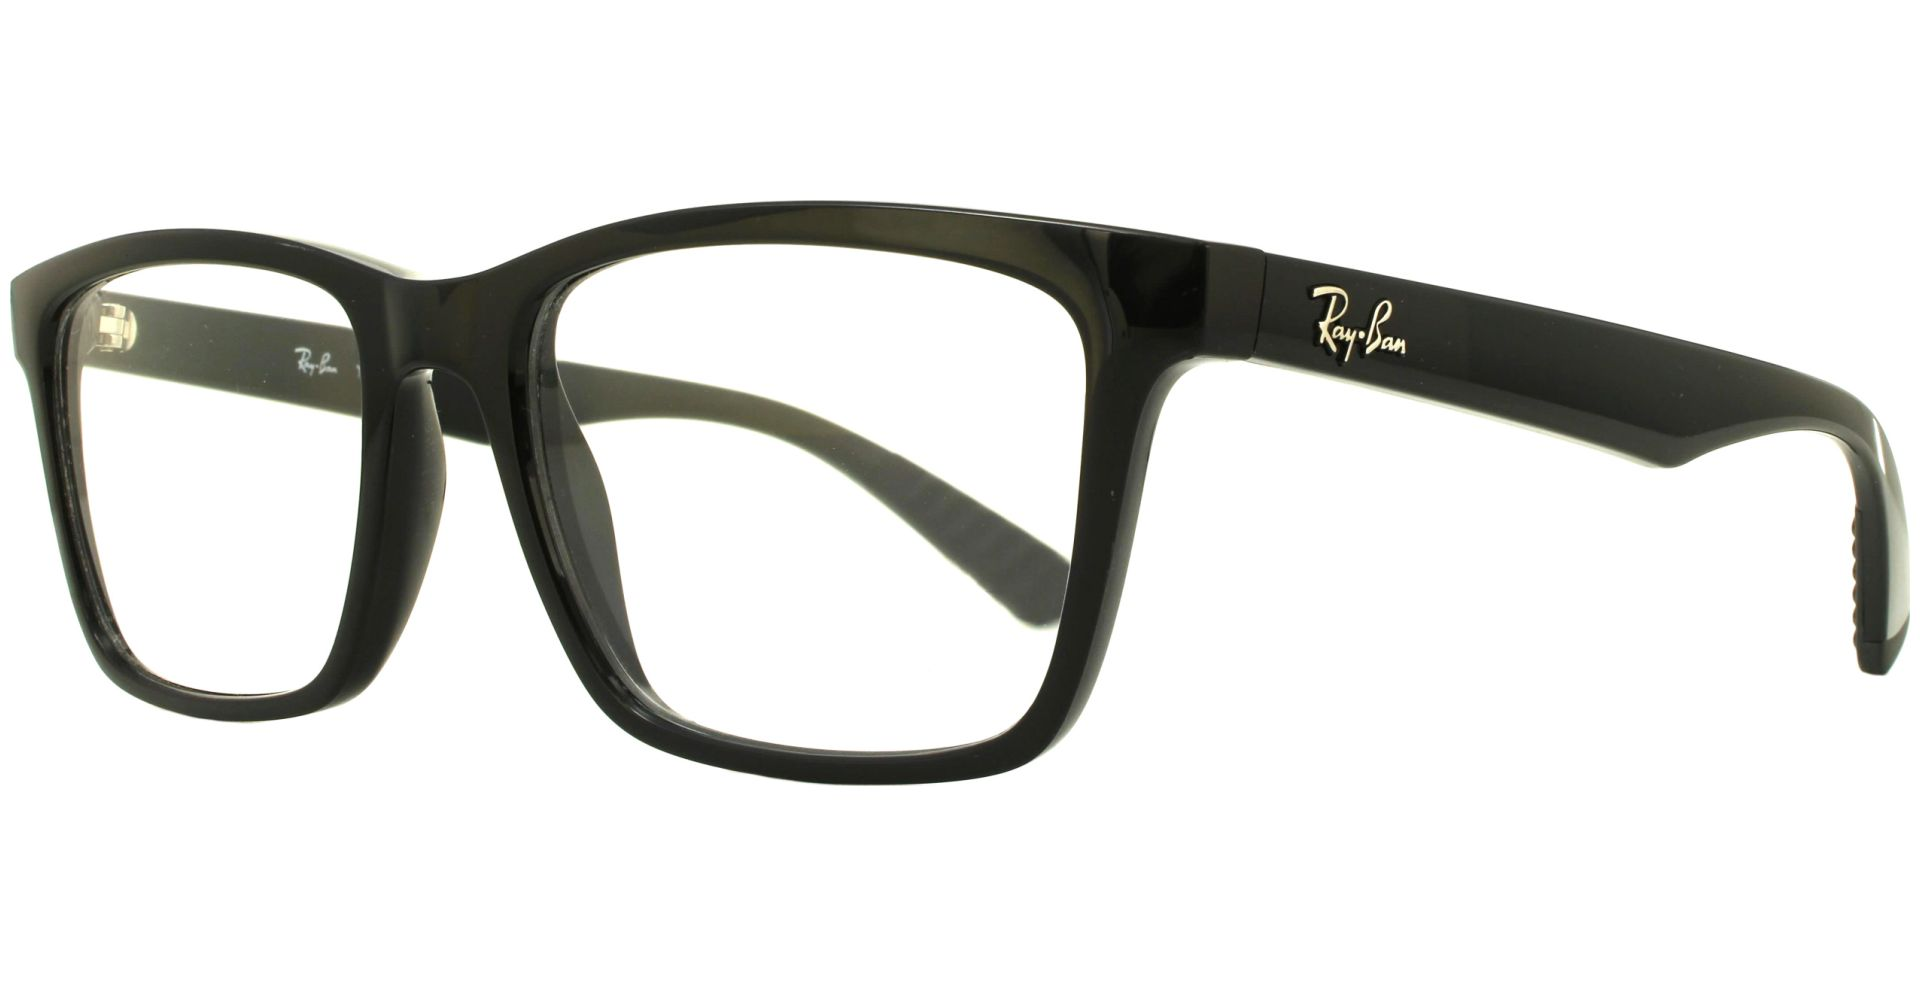 48a4c035c0 Ray-Ban - RB7025 2000 5317 Shiny Black - von Lensbest